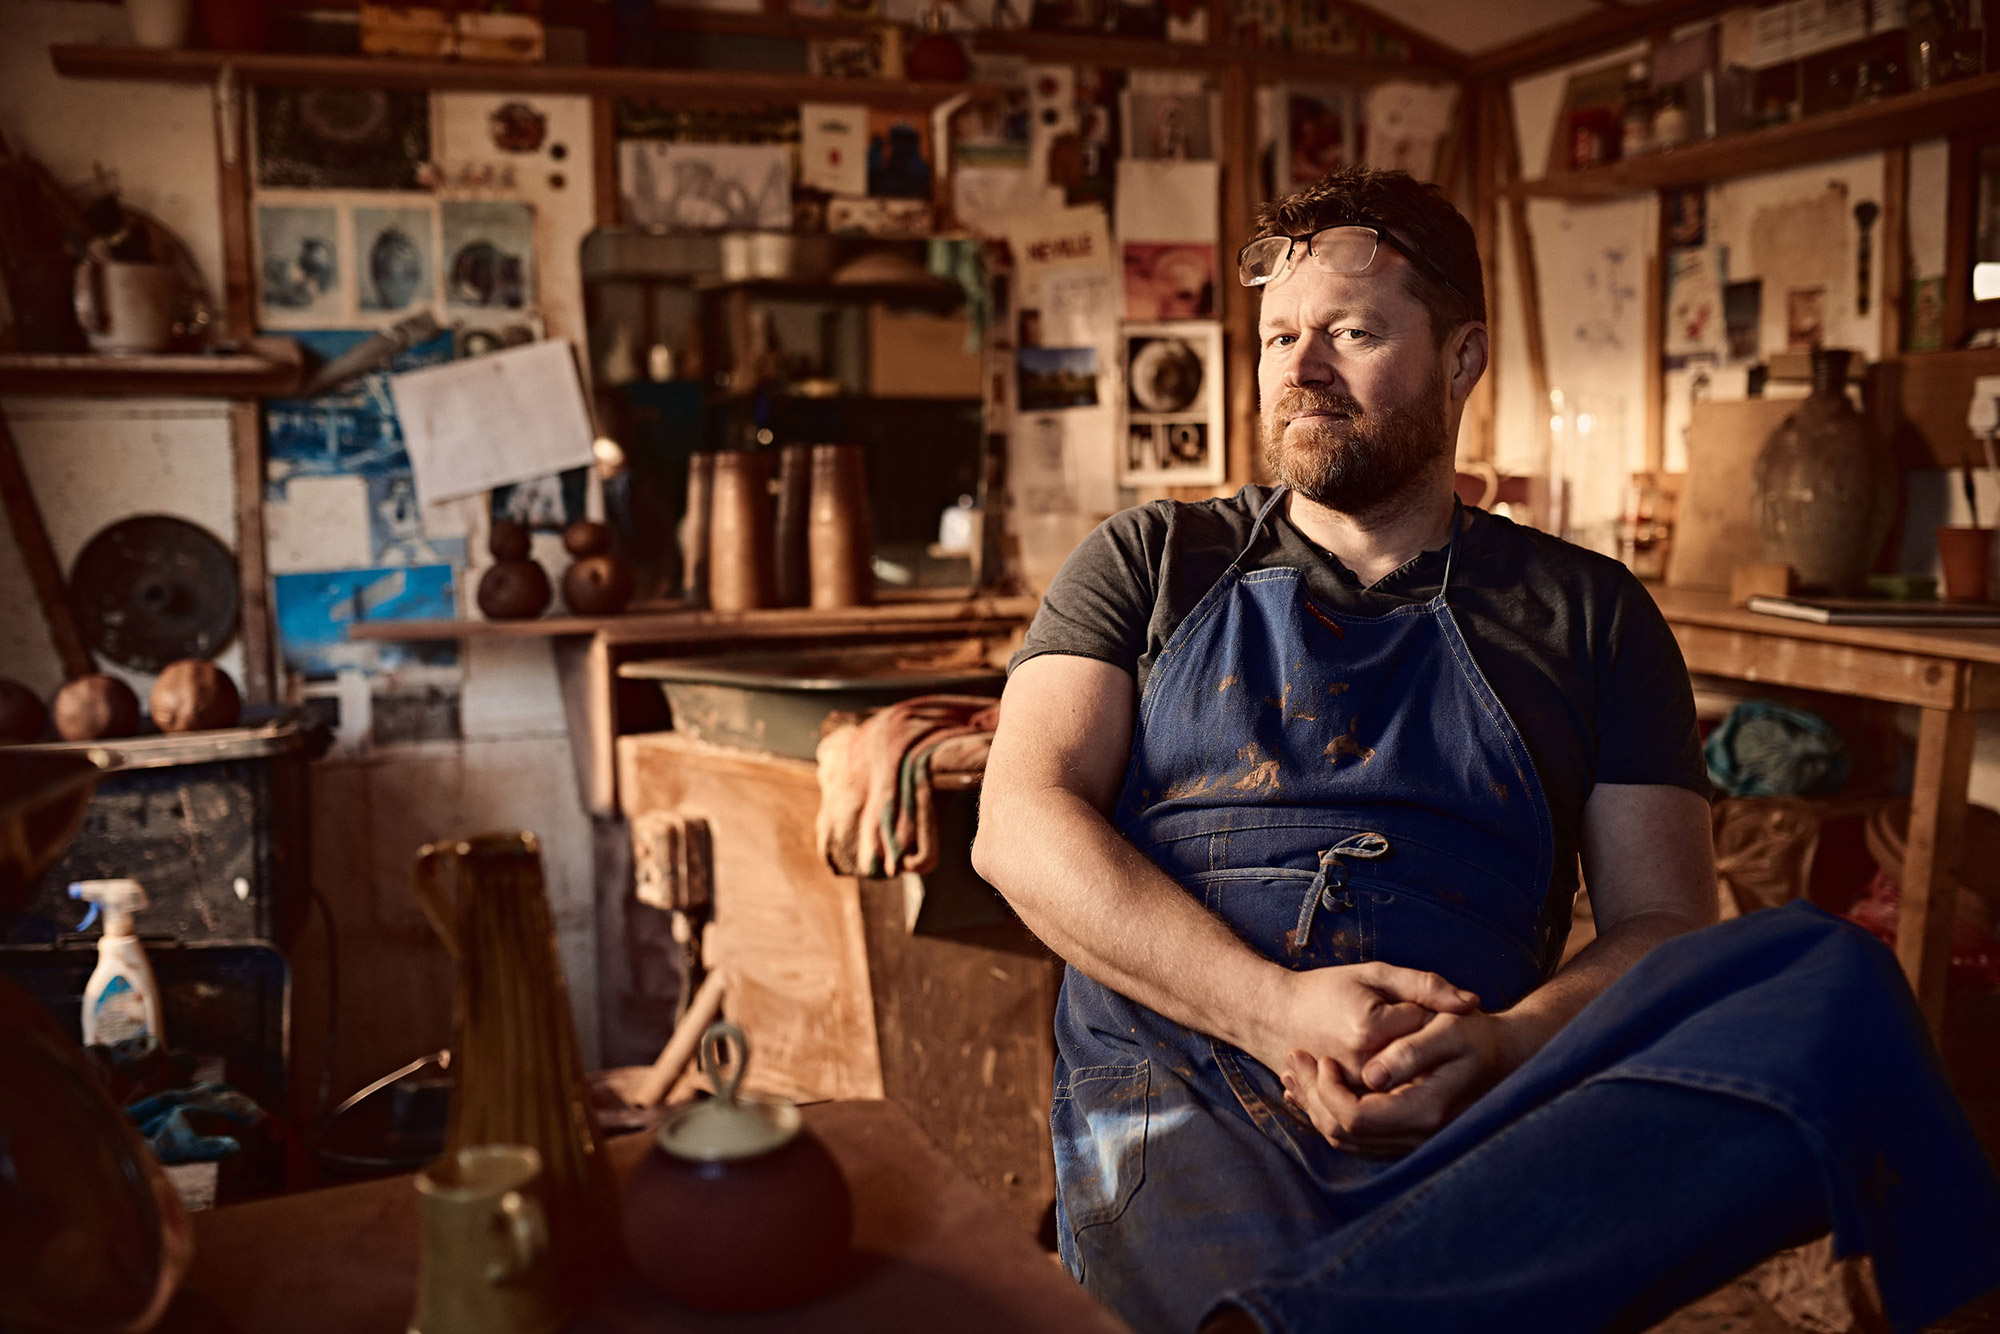 Portrait of artist Neville Tatham in his garden studio